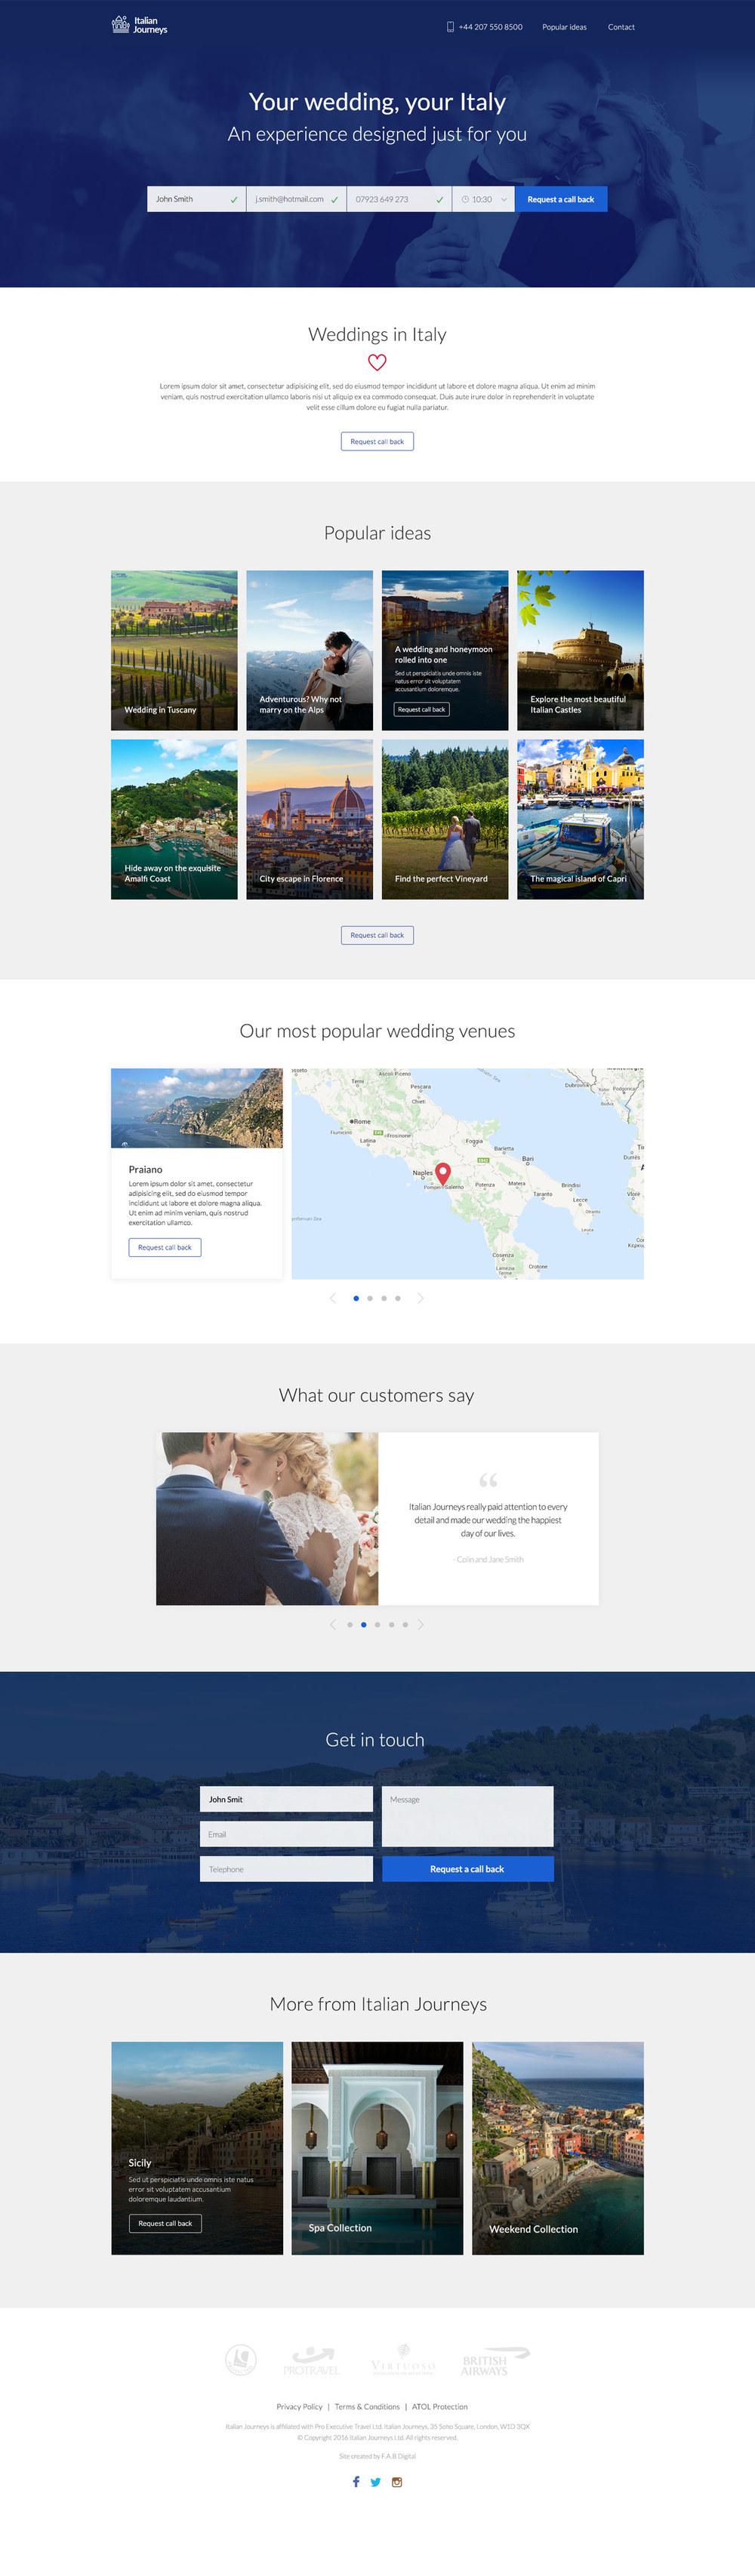 Italian Journeys landing page